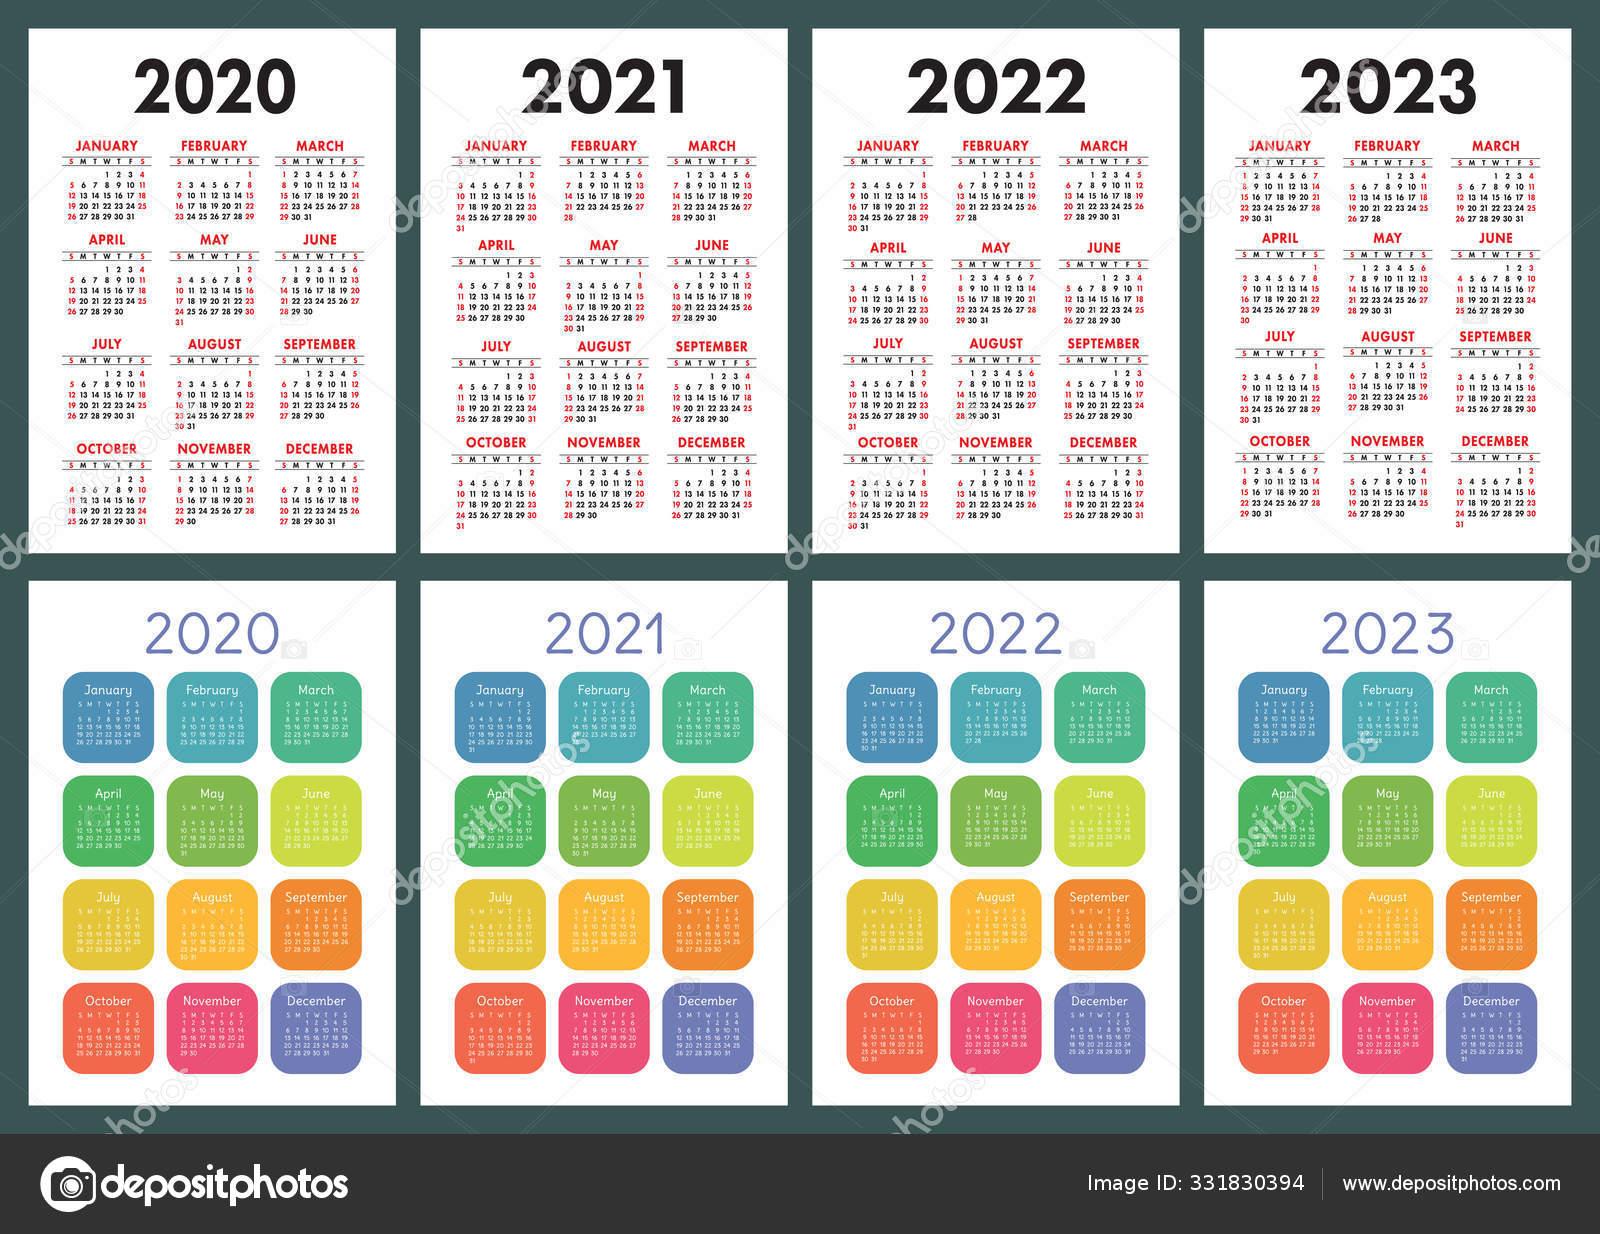 Big Calendar 2022.Calendar 2020 2021 2022 2023 English Color Vector Set Vertical Vector Image By C Ra Khusnullina Gmail Com14722860aef0a814722860 Vector Stock 331830394